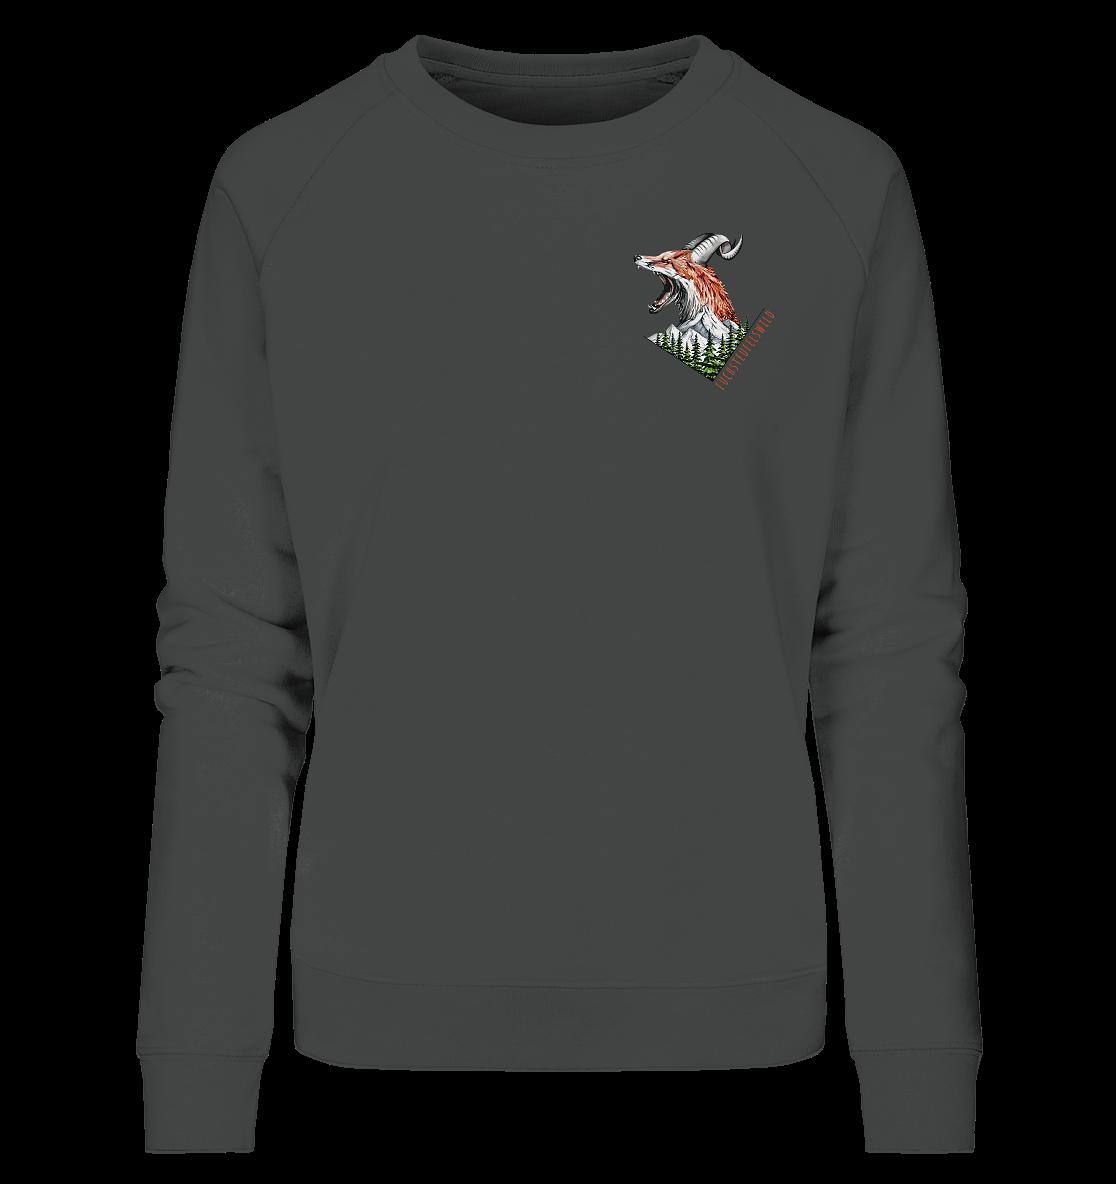 front-ladies-organic-sweatshirt-444545-1116x-1.png